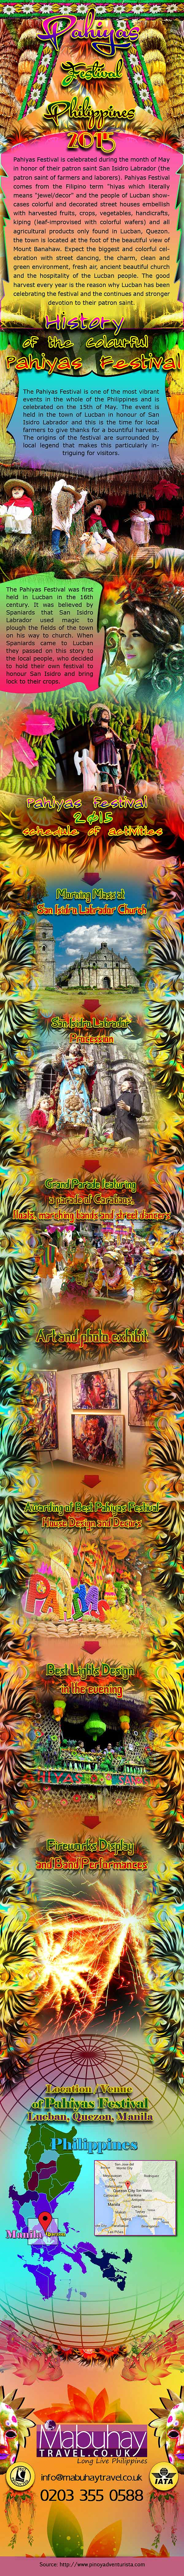 Pahiyas Festival Philippines 2015